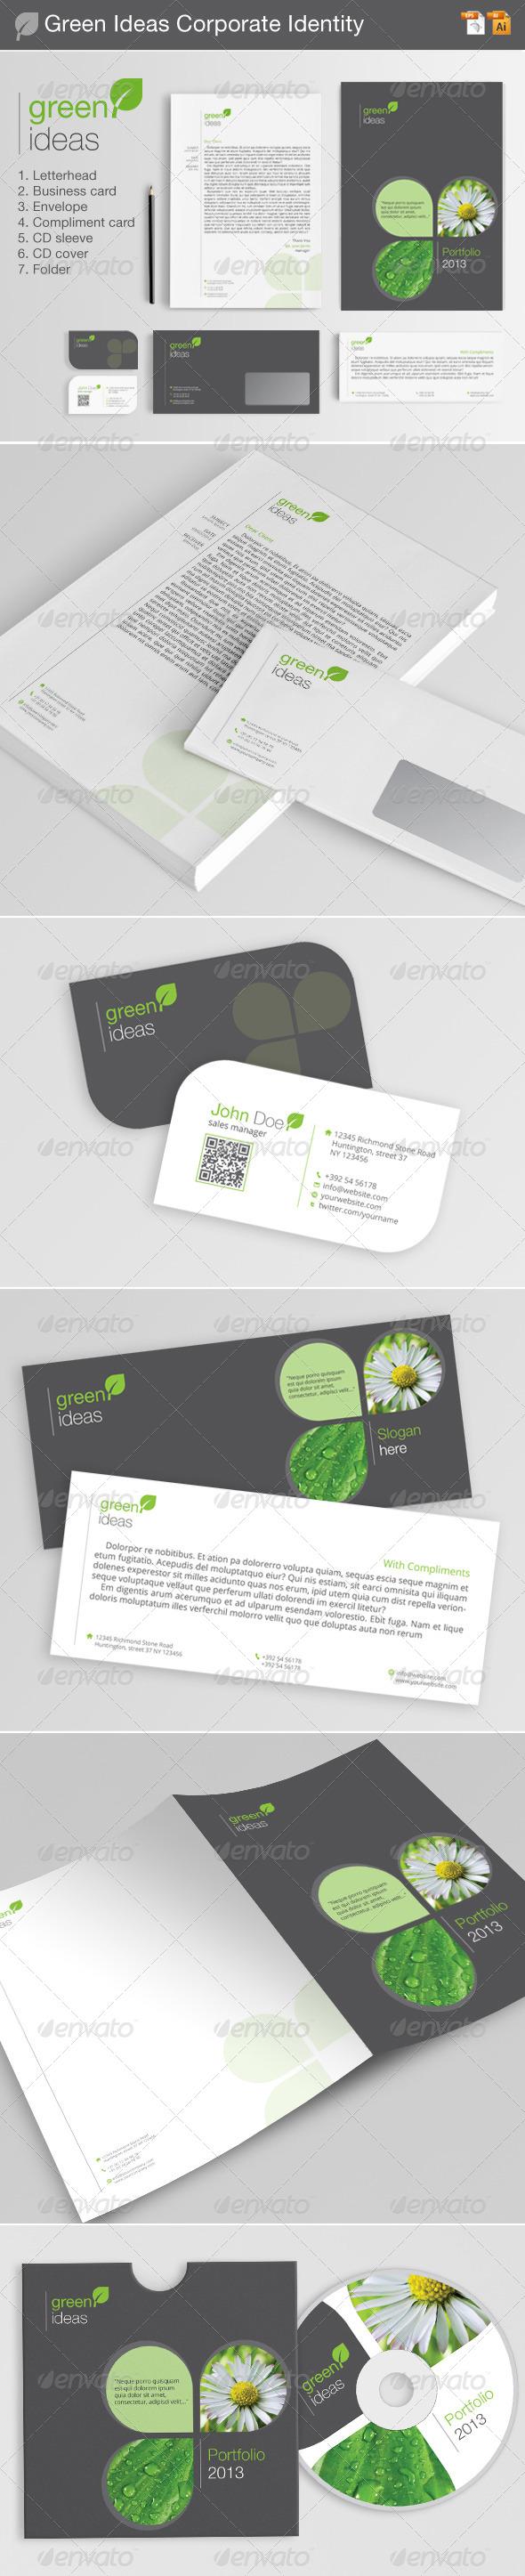 Green Ideas Corporate Identity - Stationery Print Templates